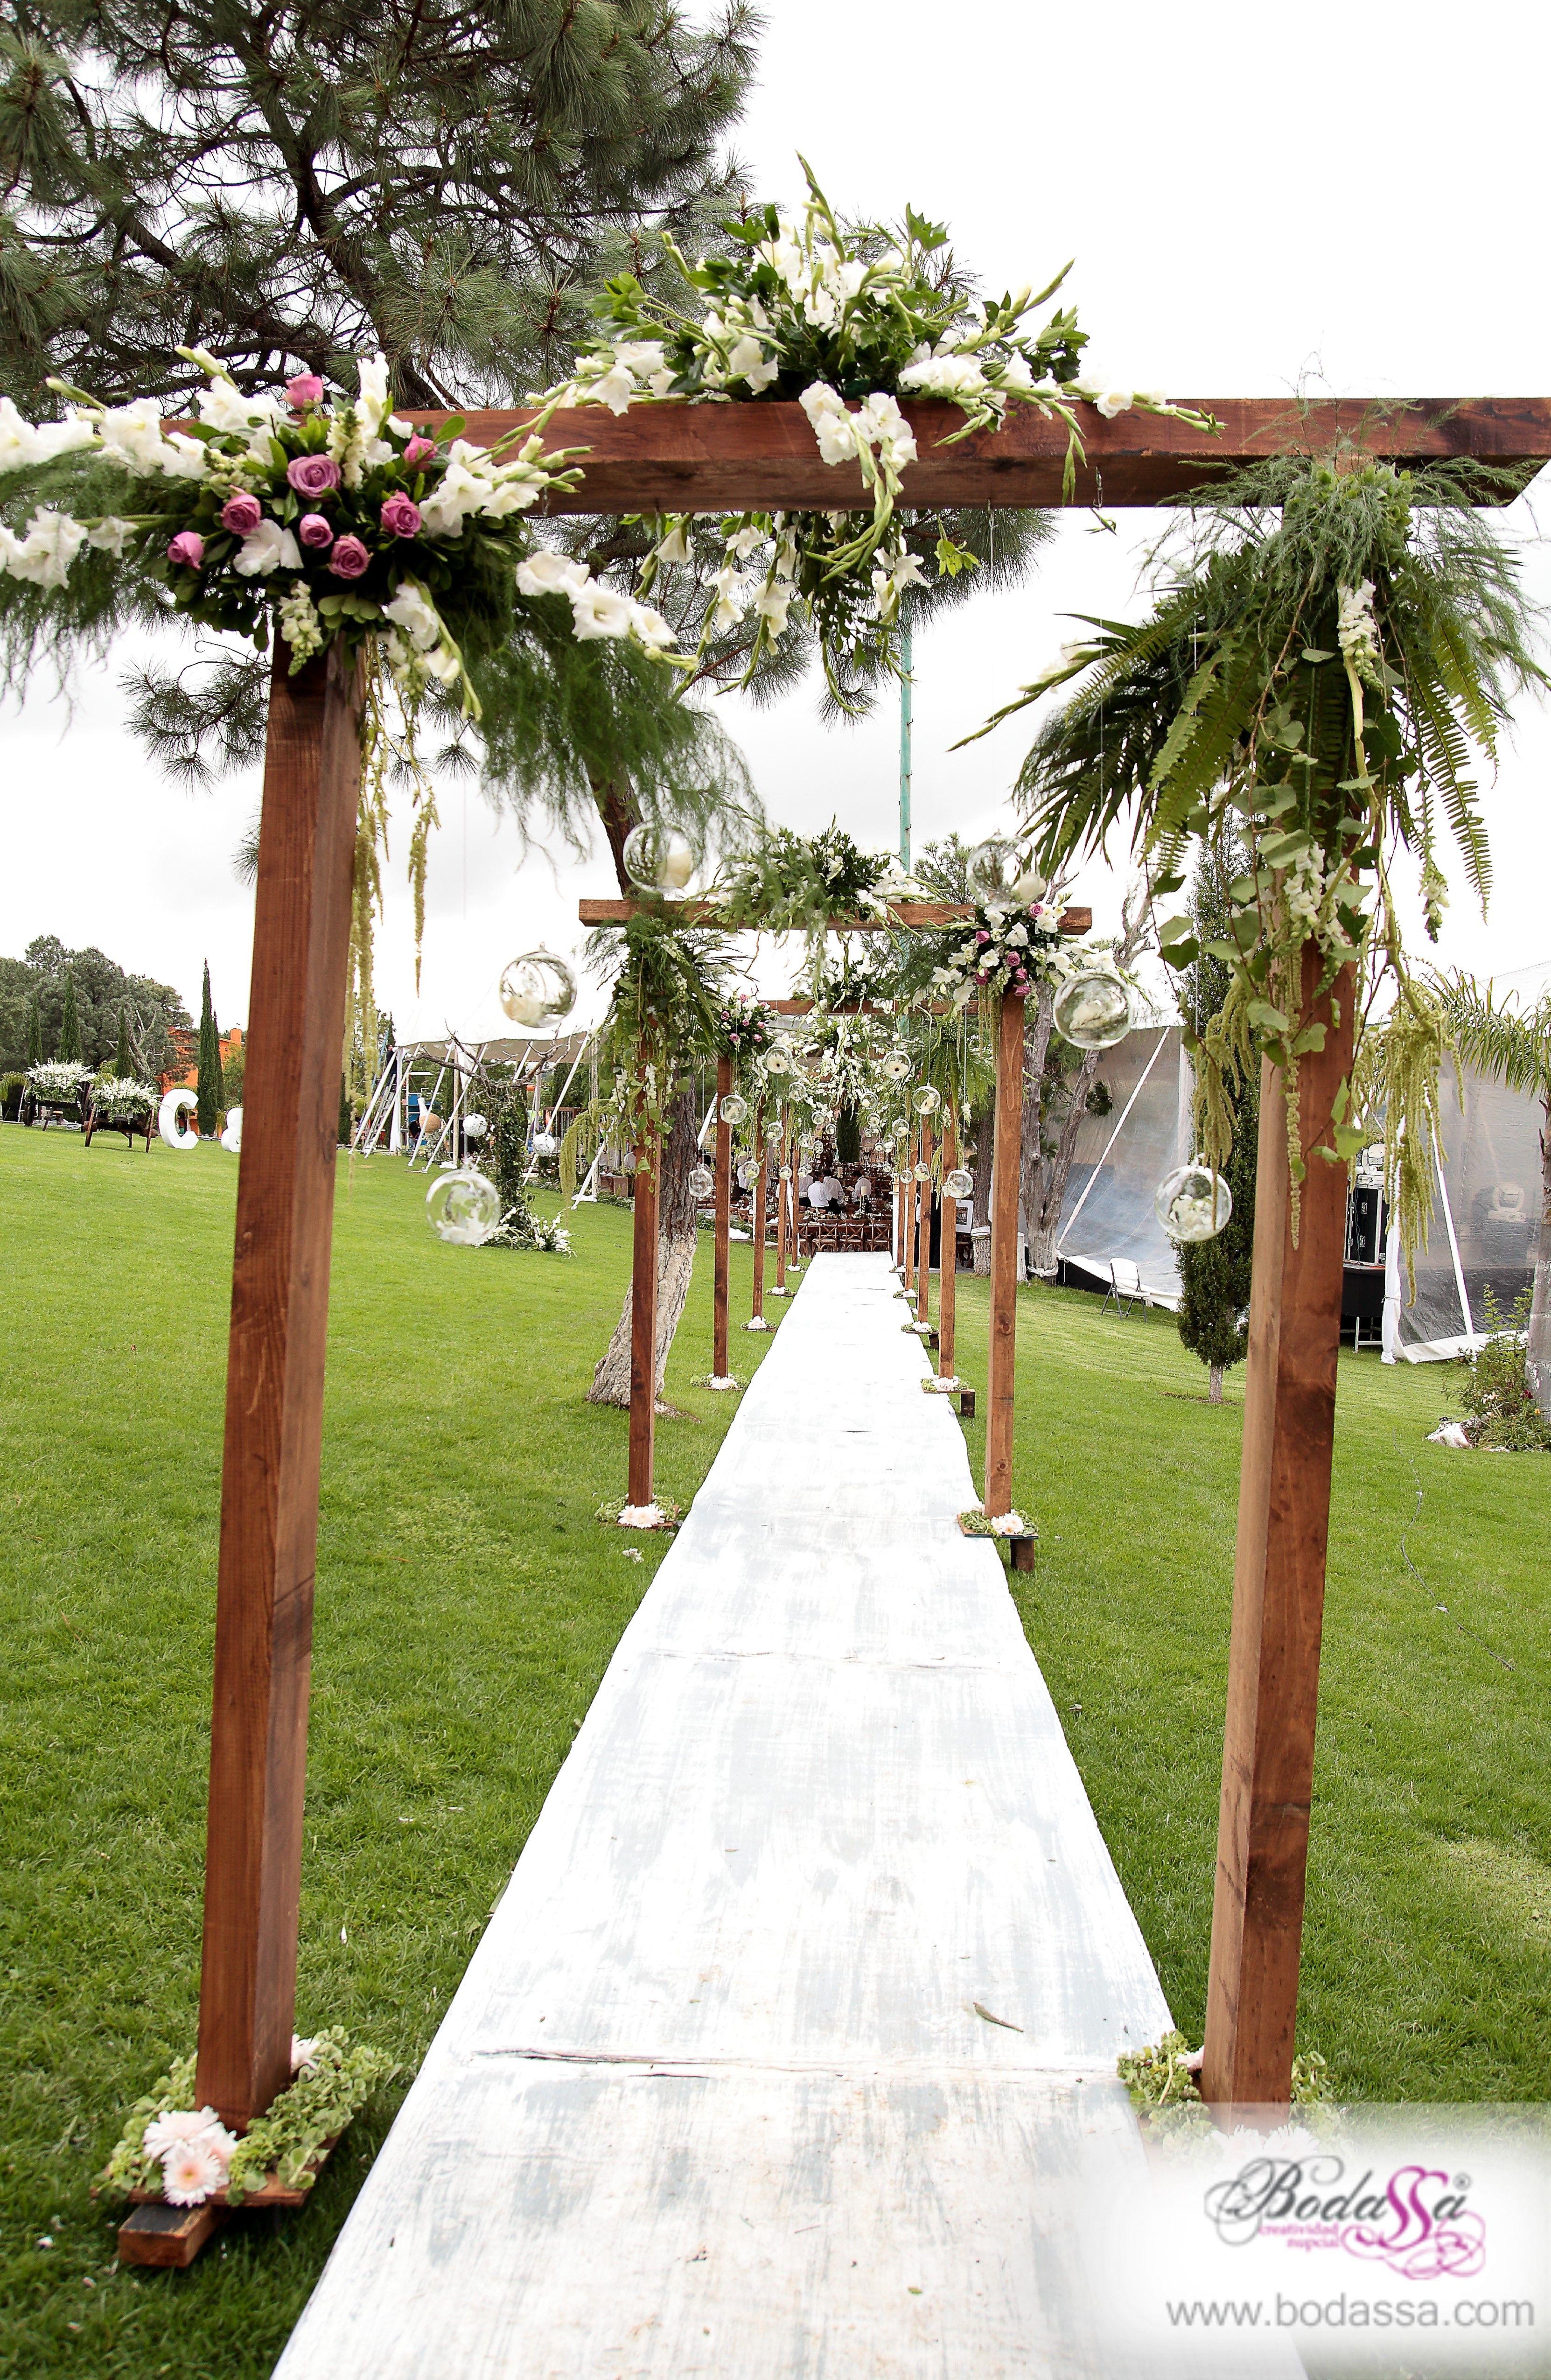 Camino con arcos de madera bodas bodassa weddingplanner - Maderas para arcos ...